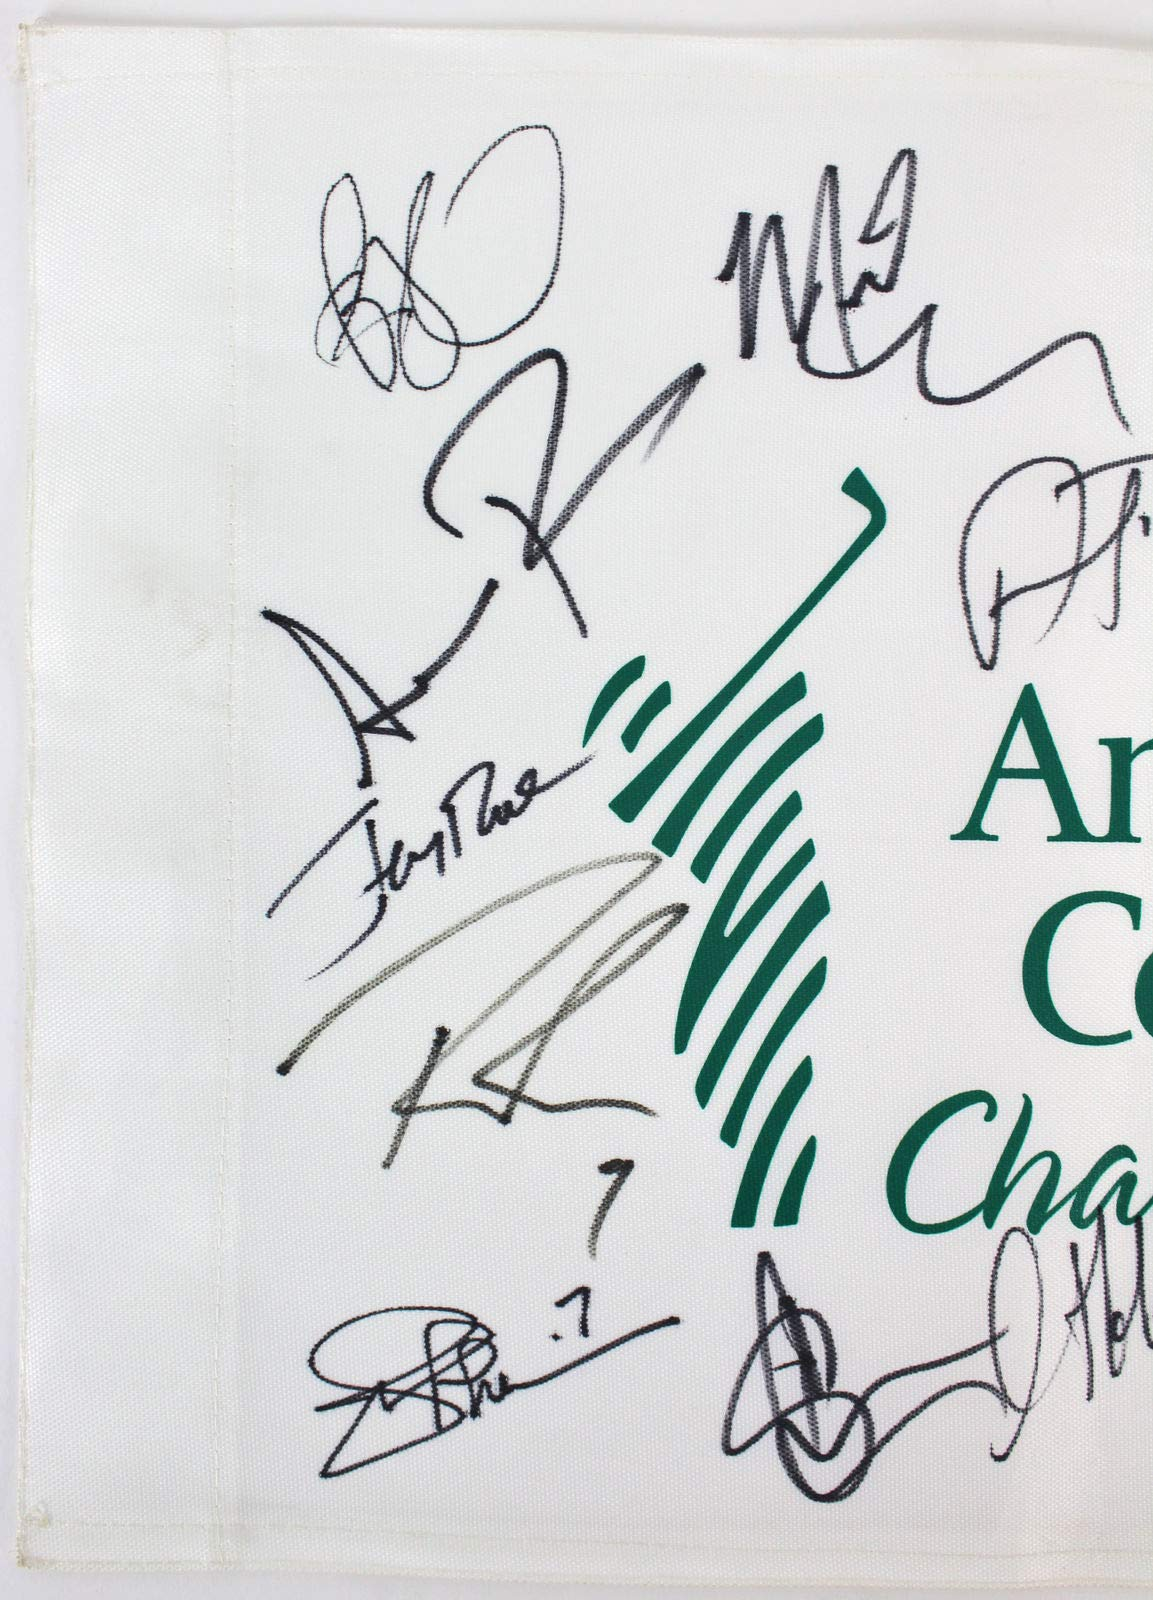 American Century 17 Romo Rice Bettis Pederson Autographed Signed Memorabilia Pin Flag Beckett #A88337